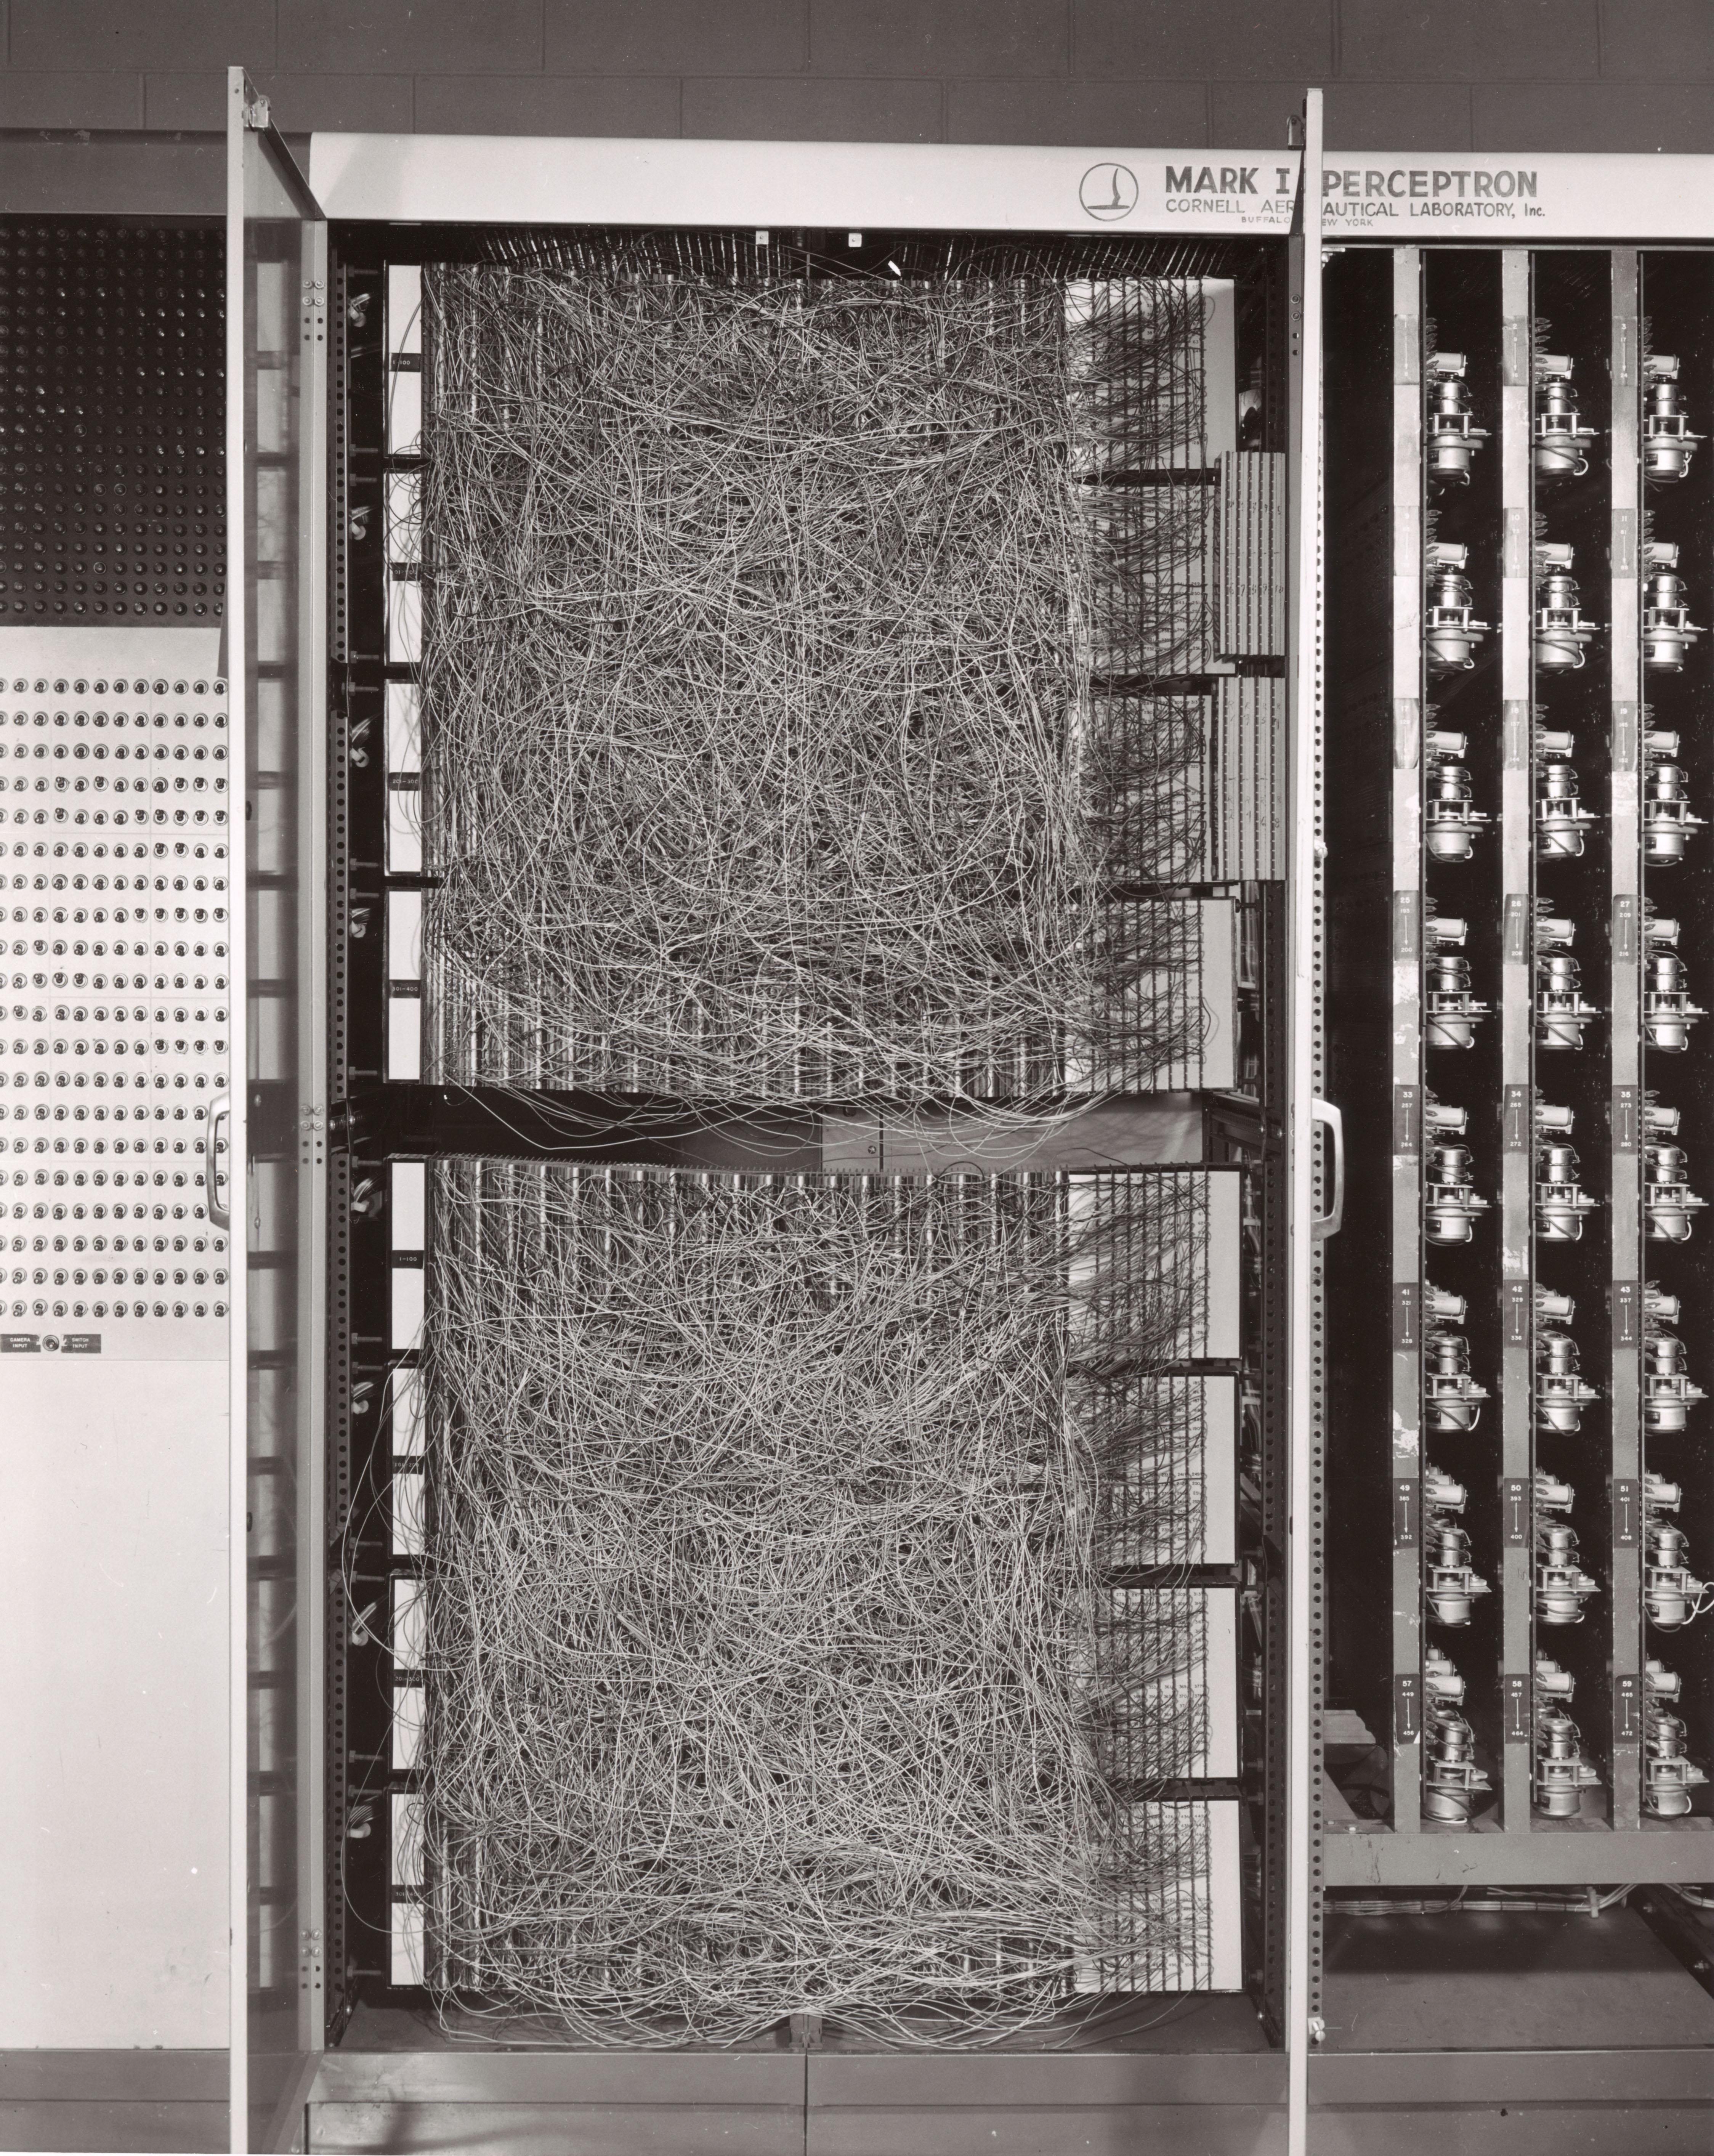 Image of the 1958 perceptron.